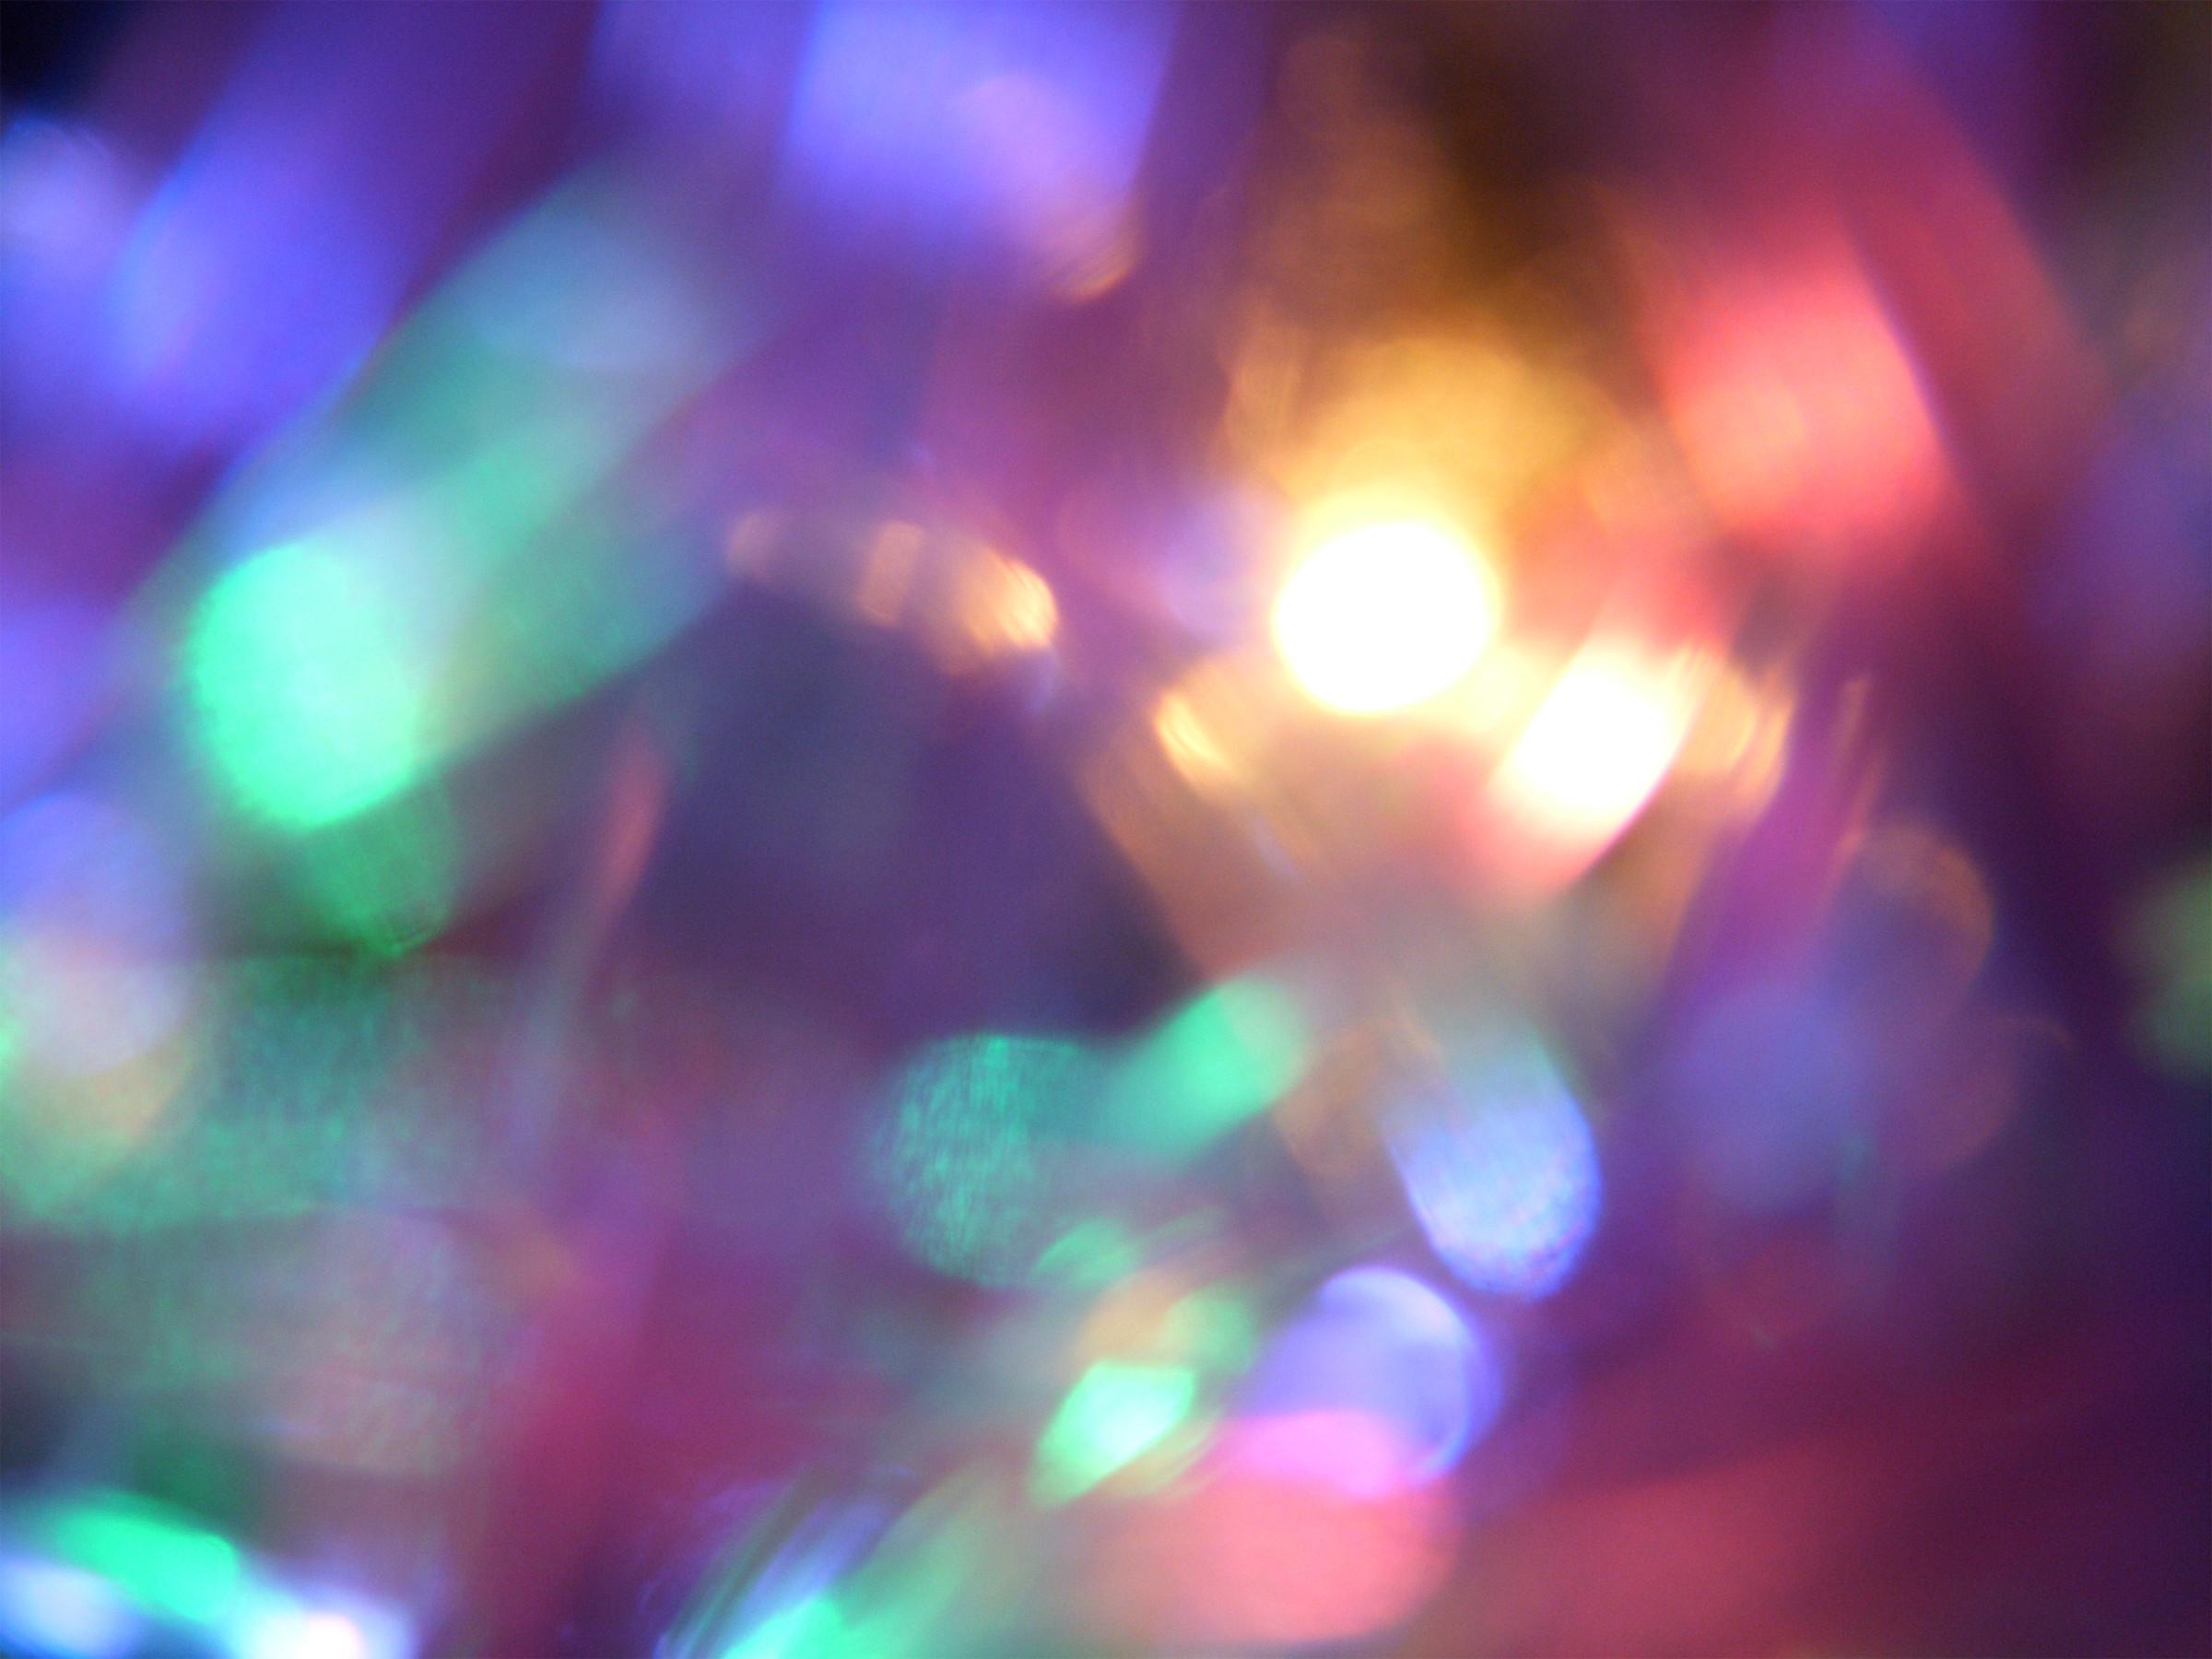 blurry desktop wallpaper 72 images